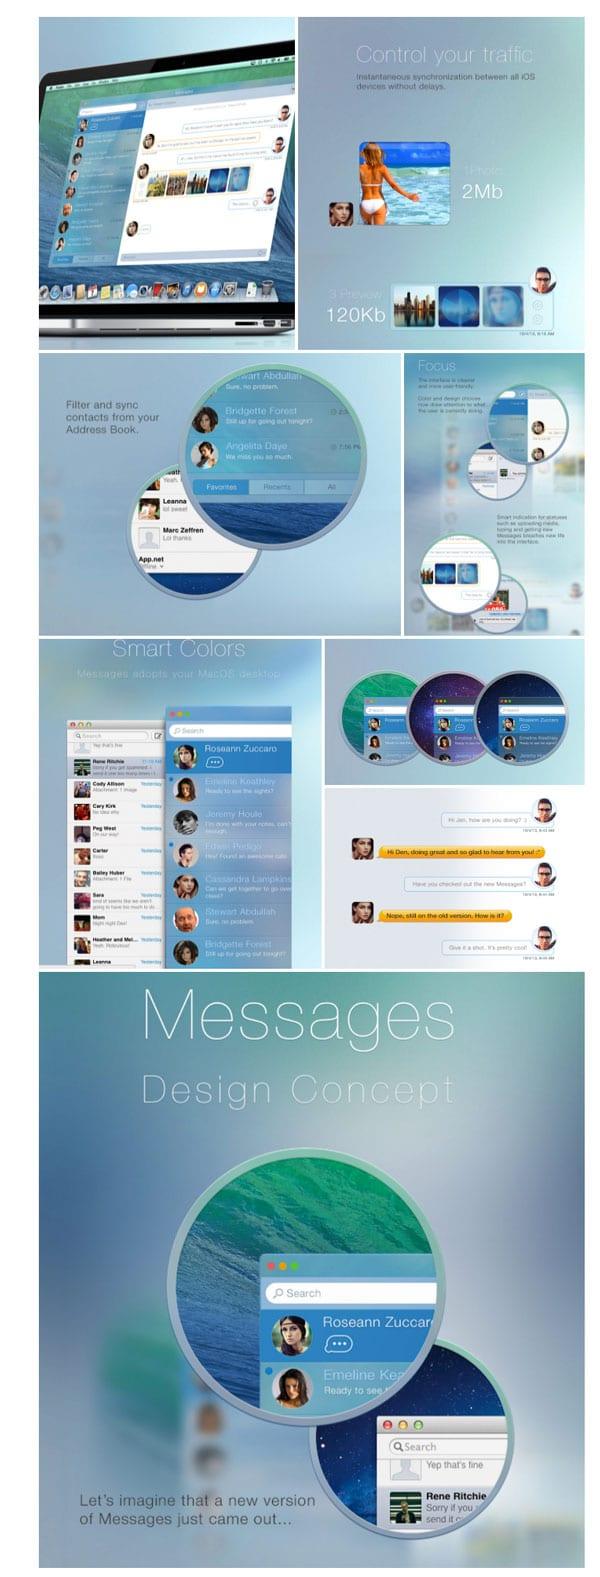 concepto-mensajes-os-x